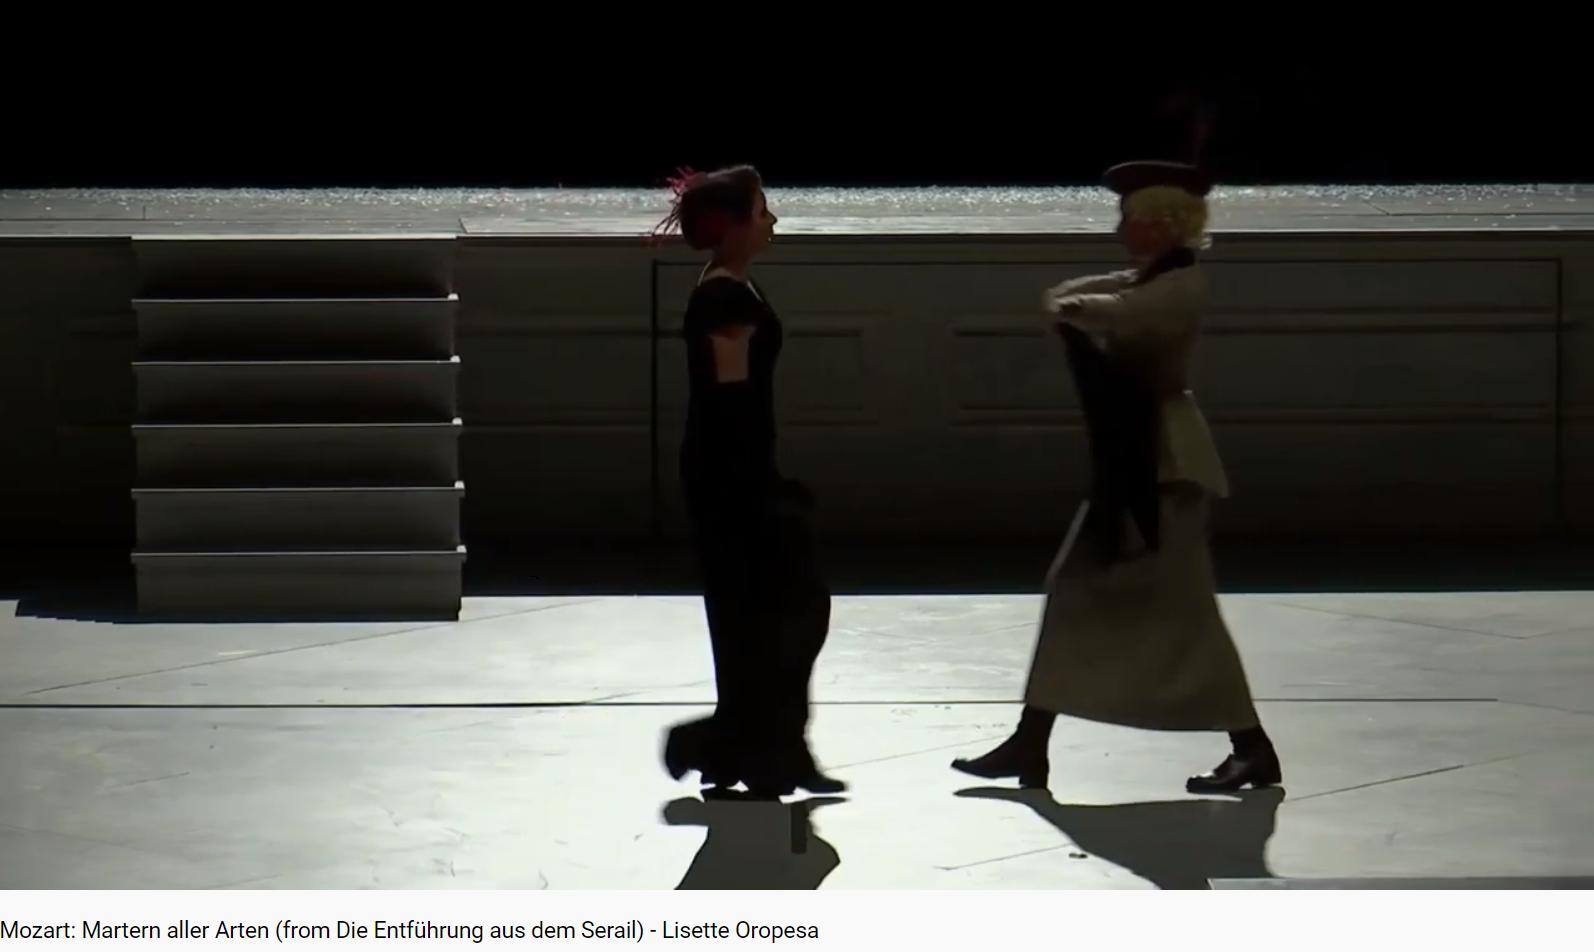 Mozart L'Enlèvement ai sérail Martern aller Arten (Vienne 2020)